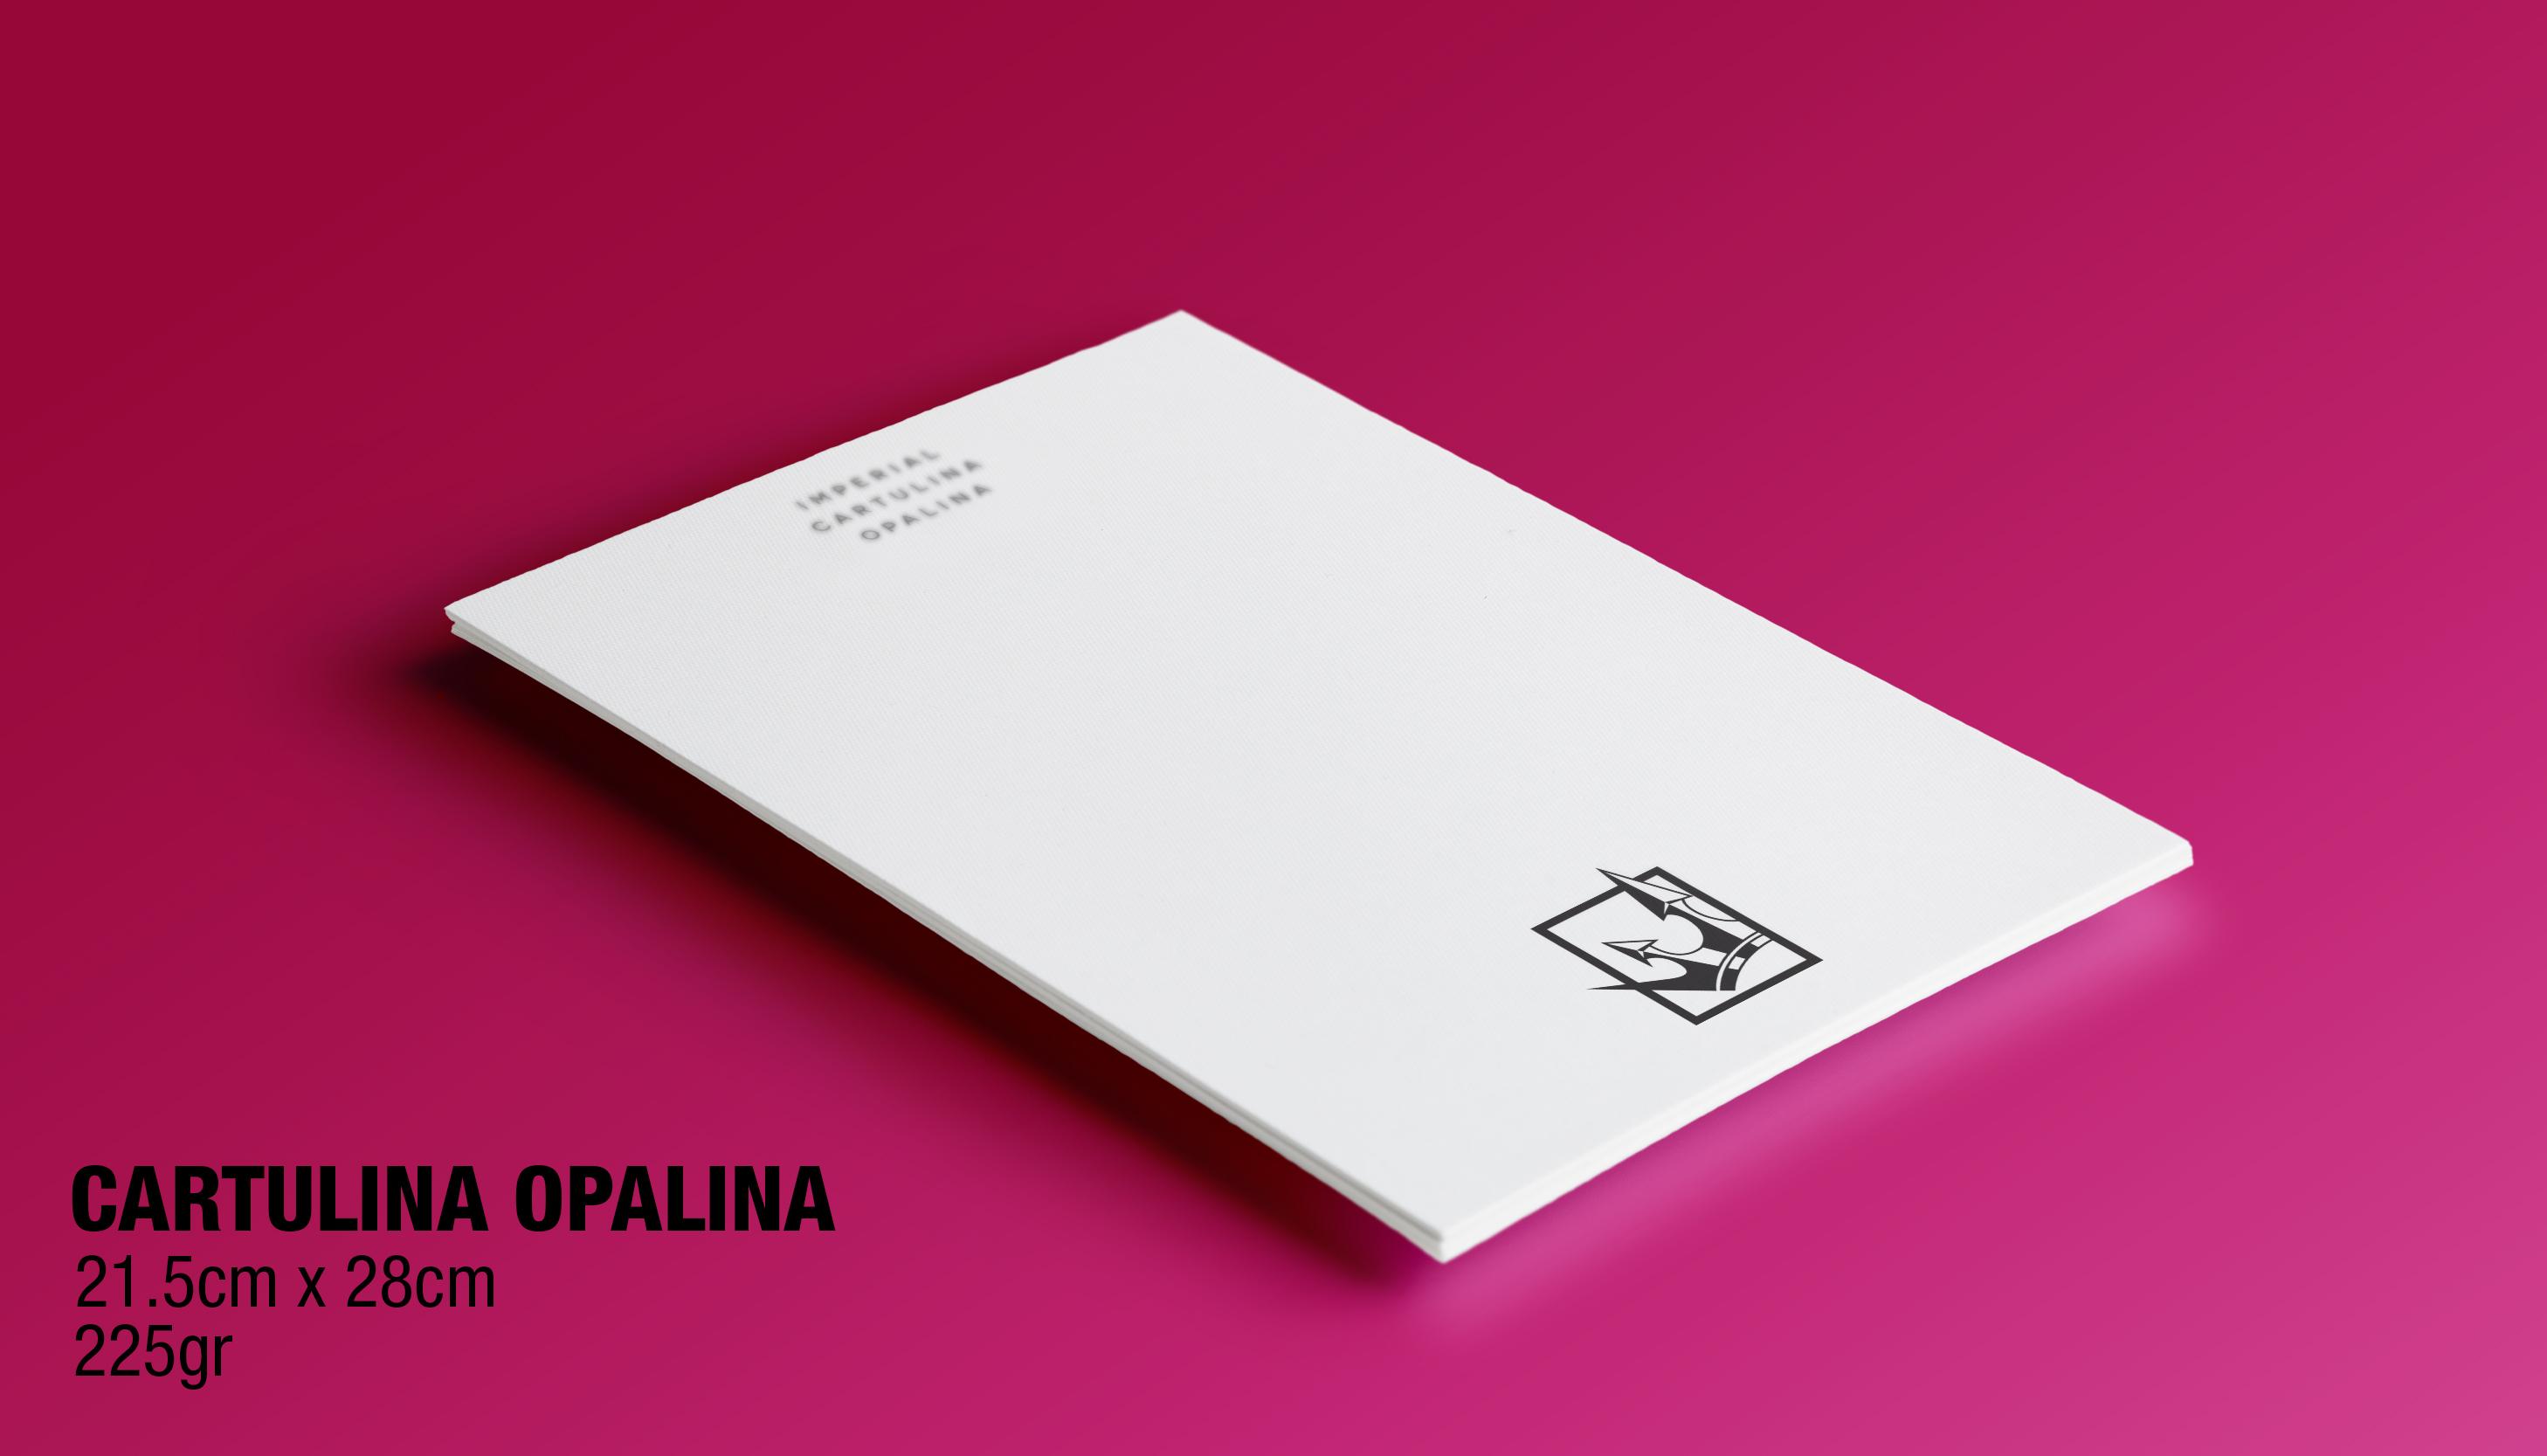 PAPEL Y CARTULINA OPALINA